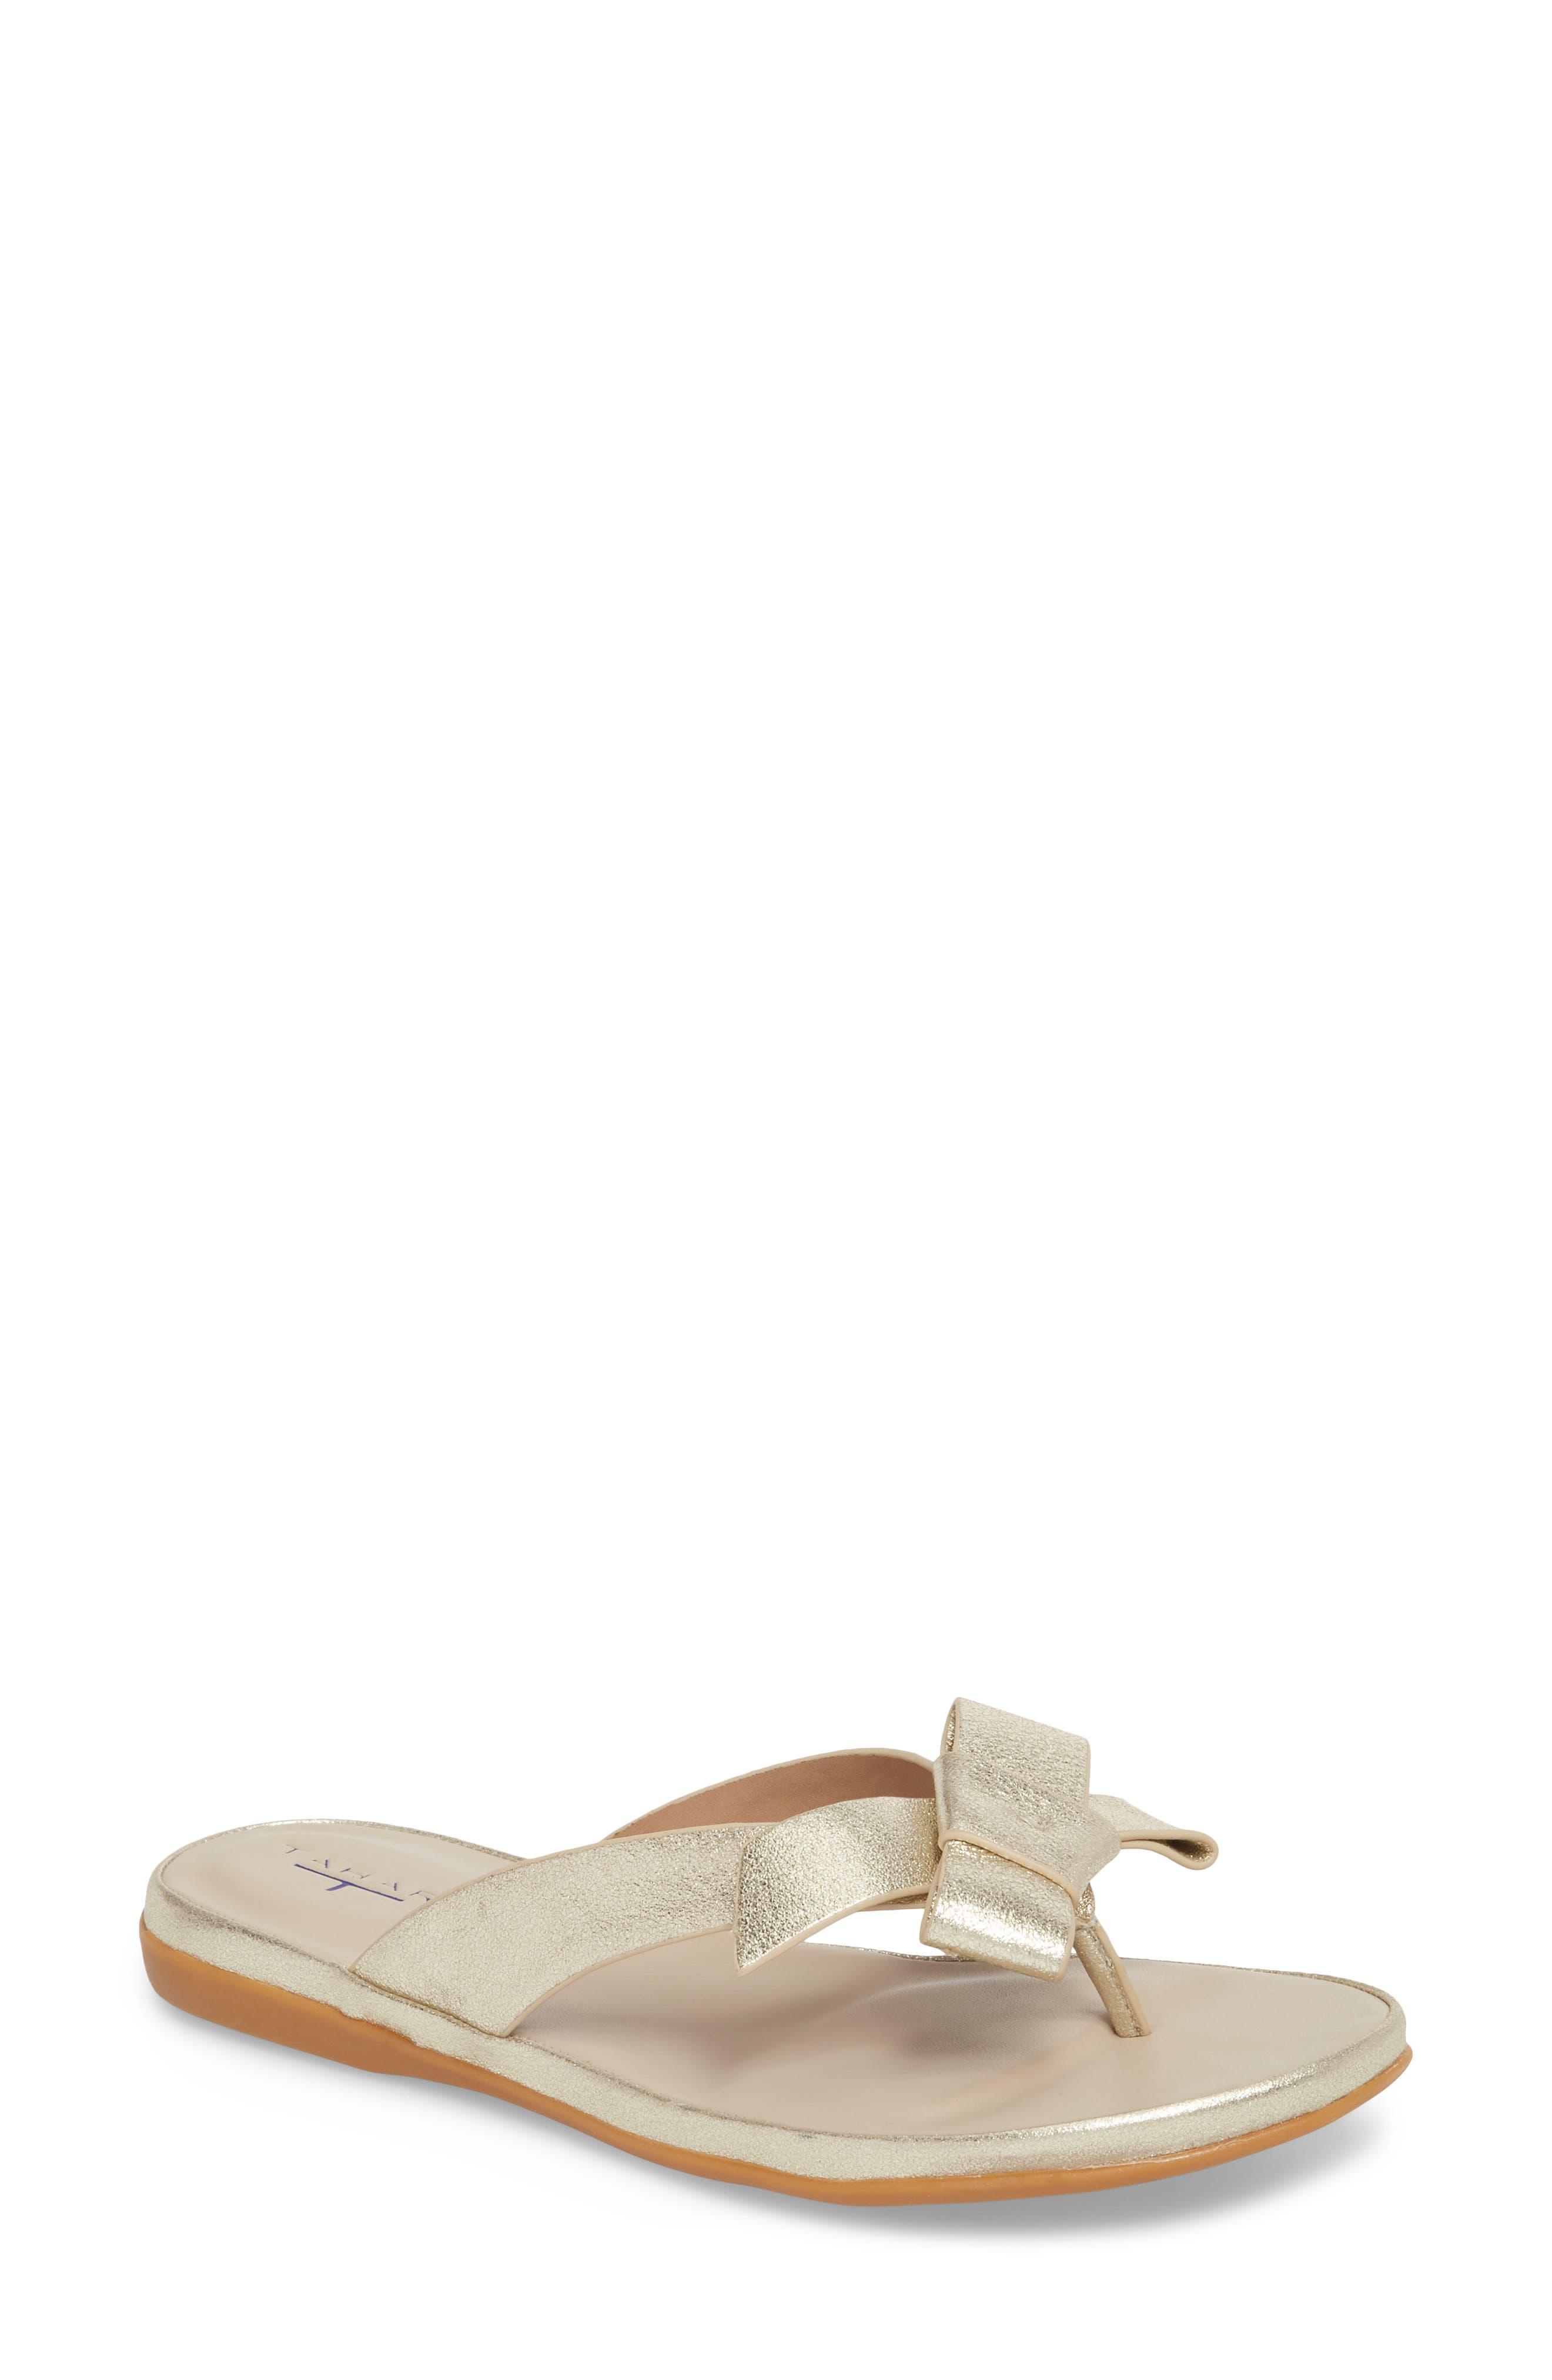 Aria Flip Flop,                         Main,                         color, Warm Gold Leather